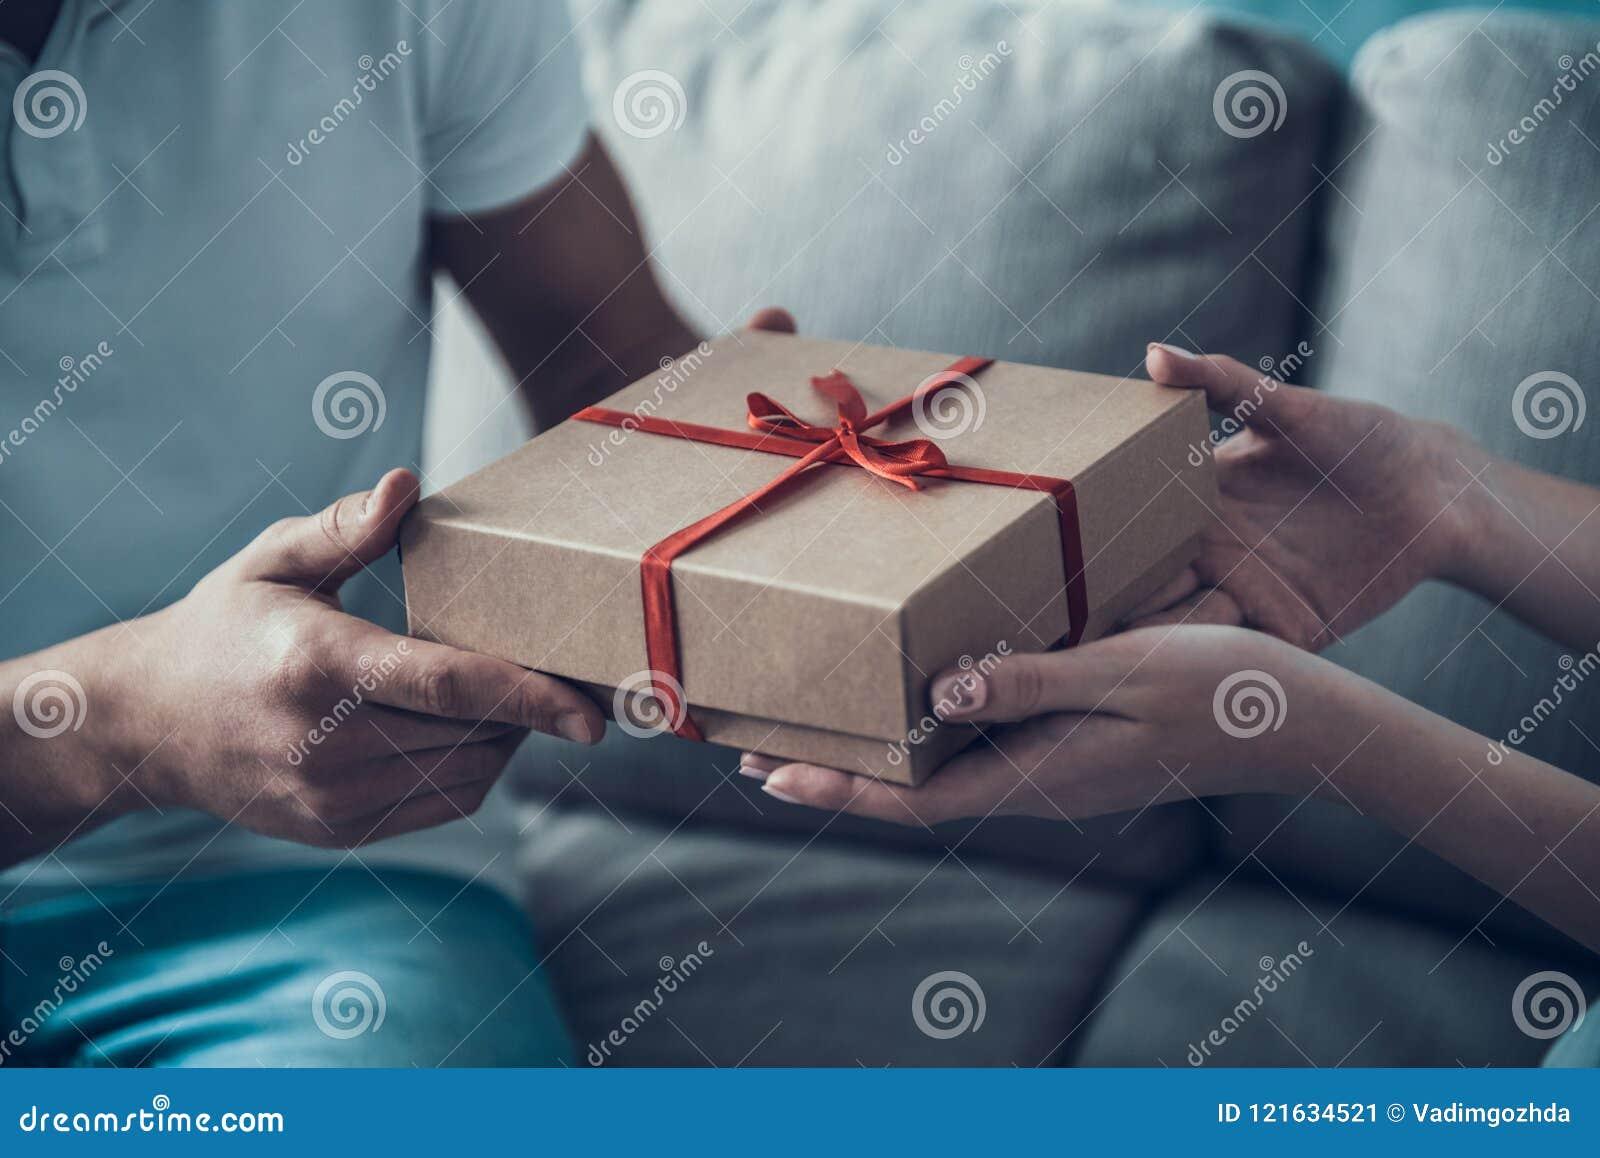 Girlfriend Giving Gift Box To Boyfriend